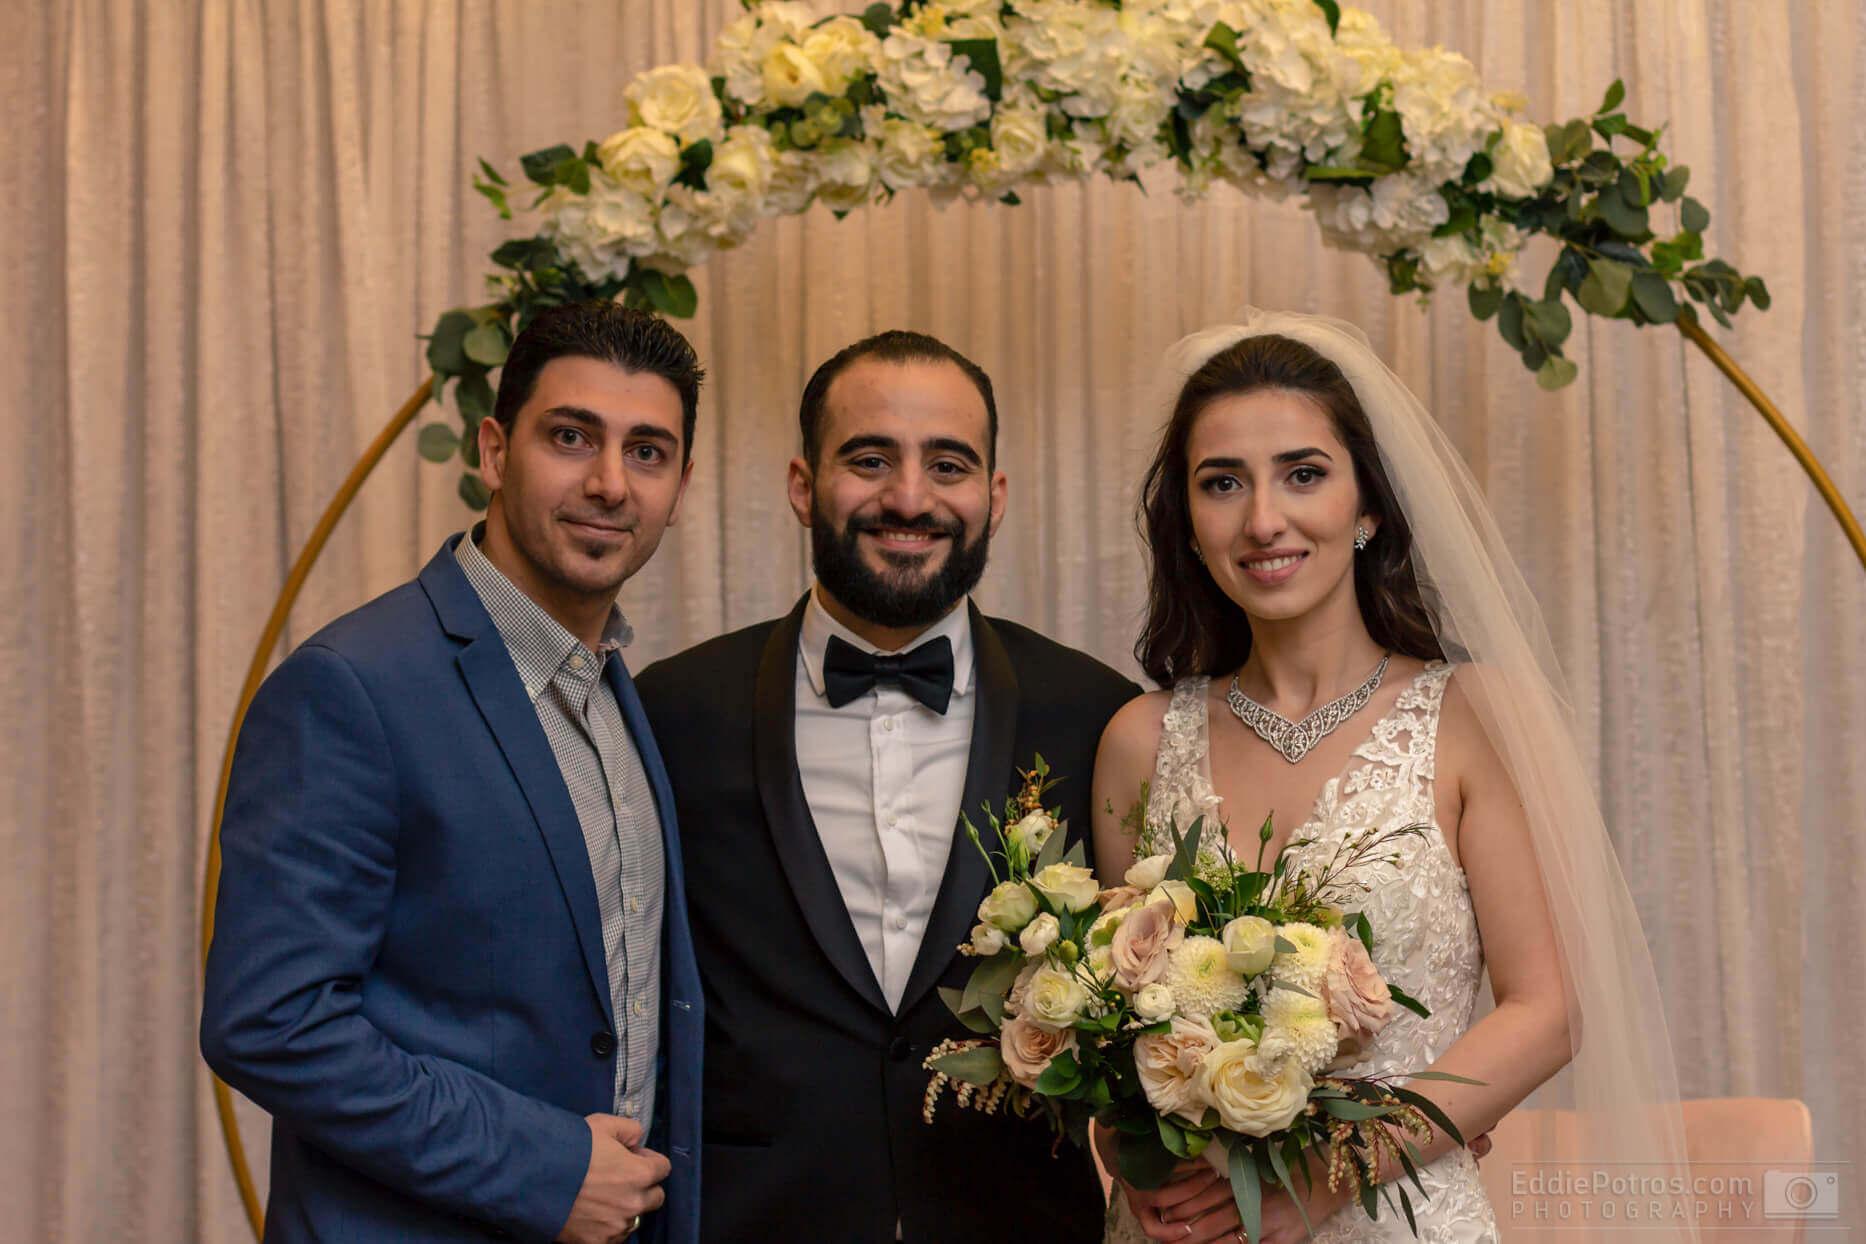 Congratulations Mazen & Hattaw on your Wedding